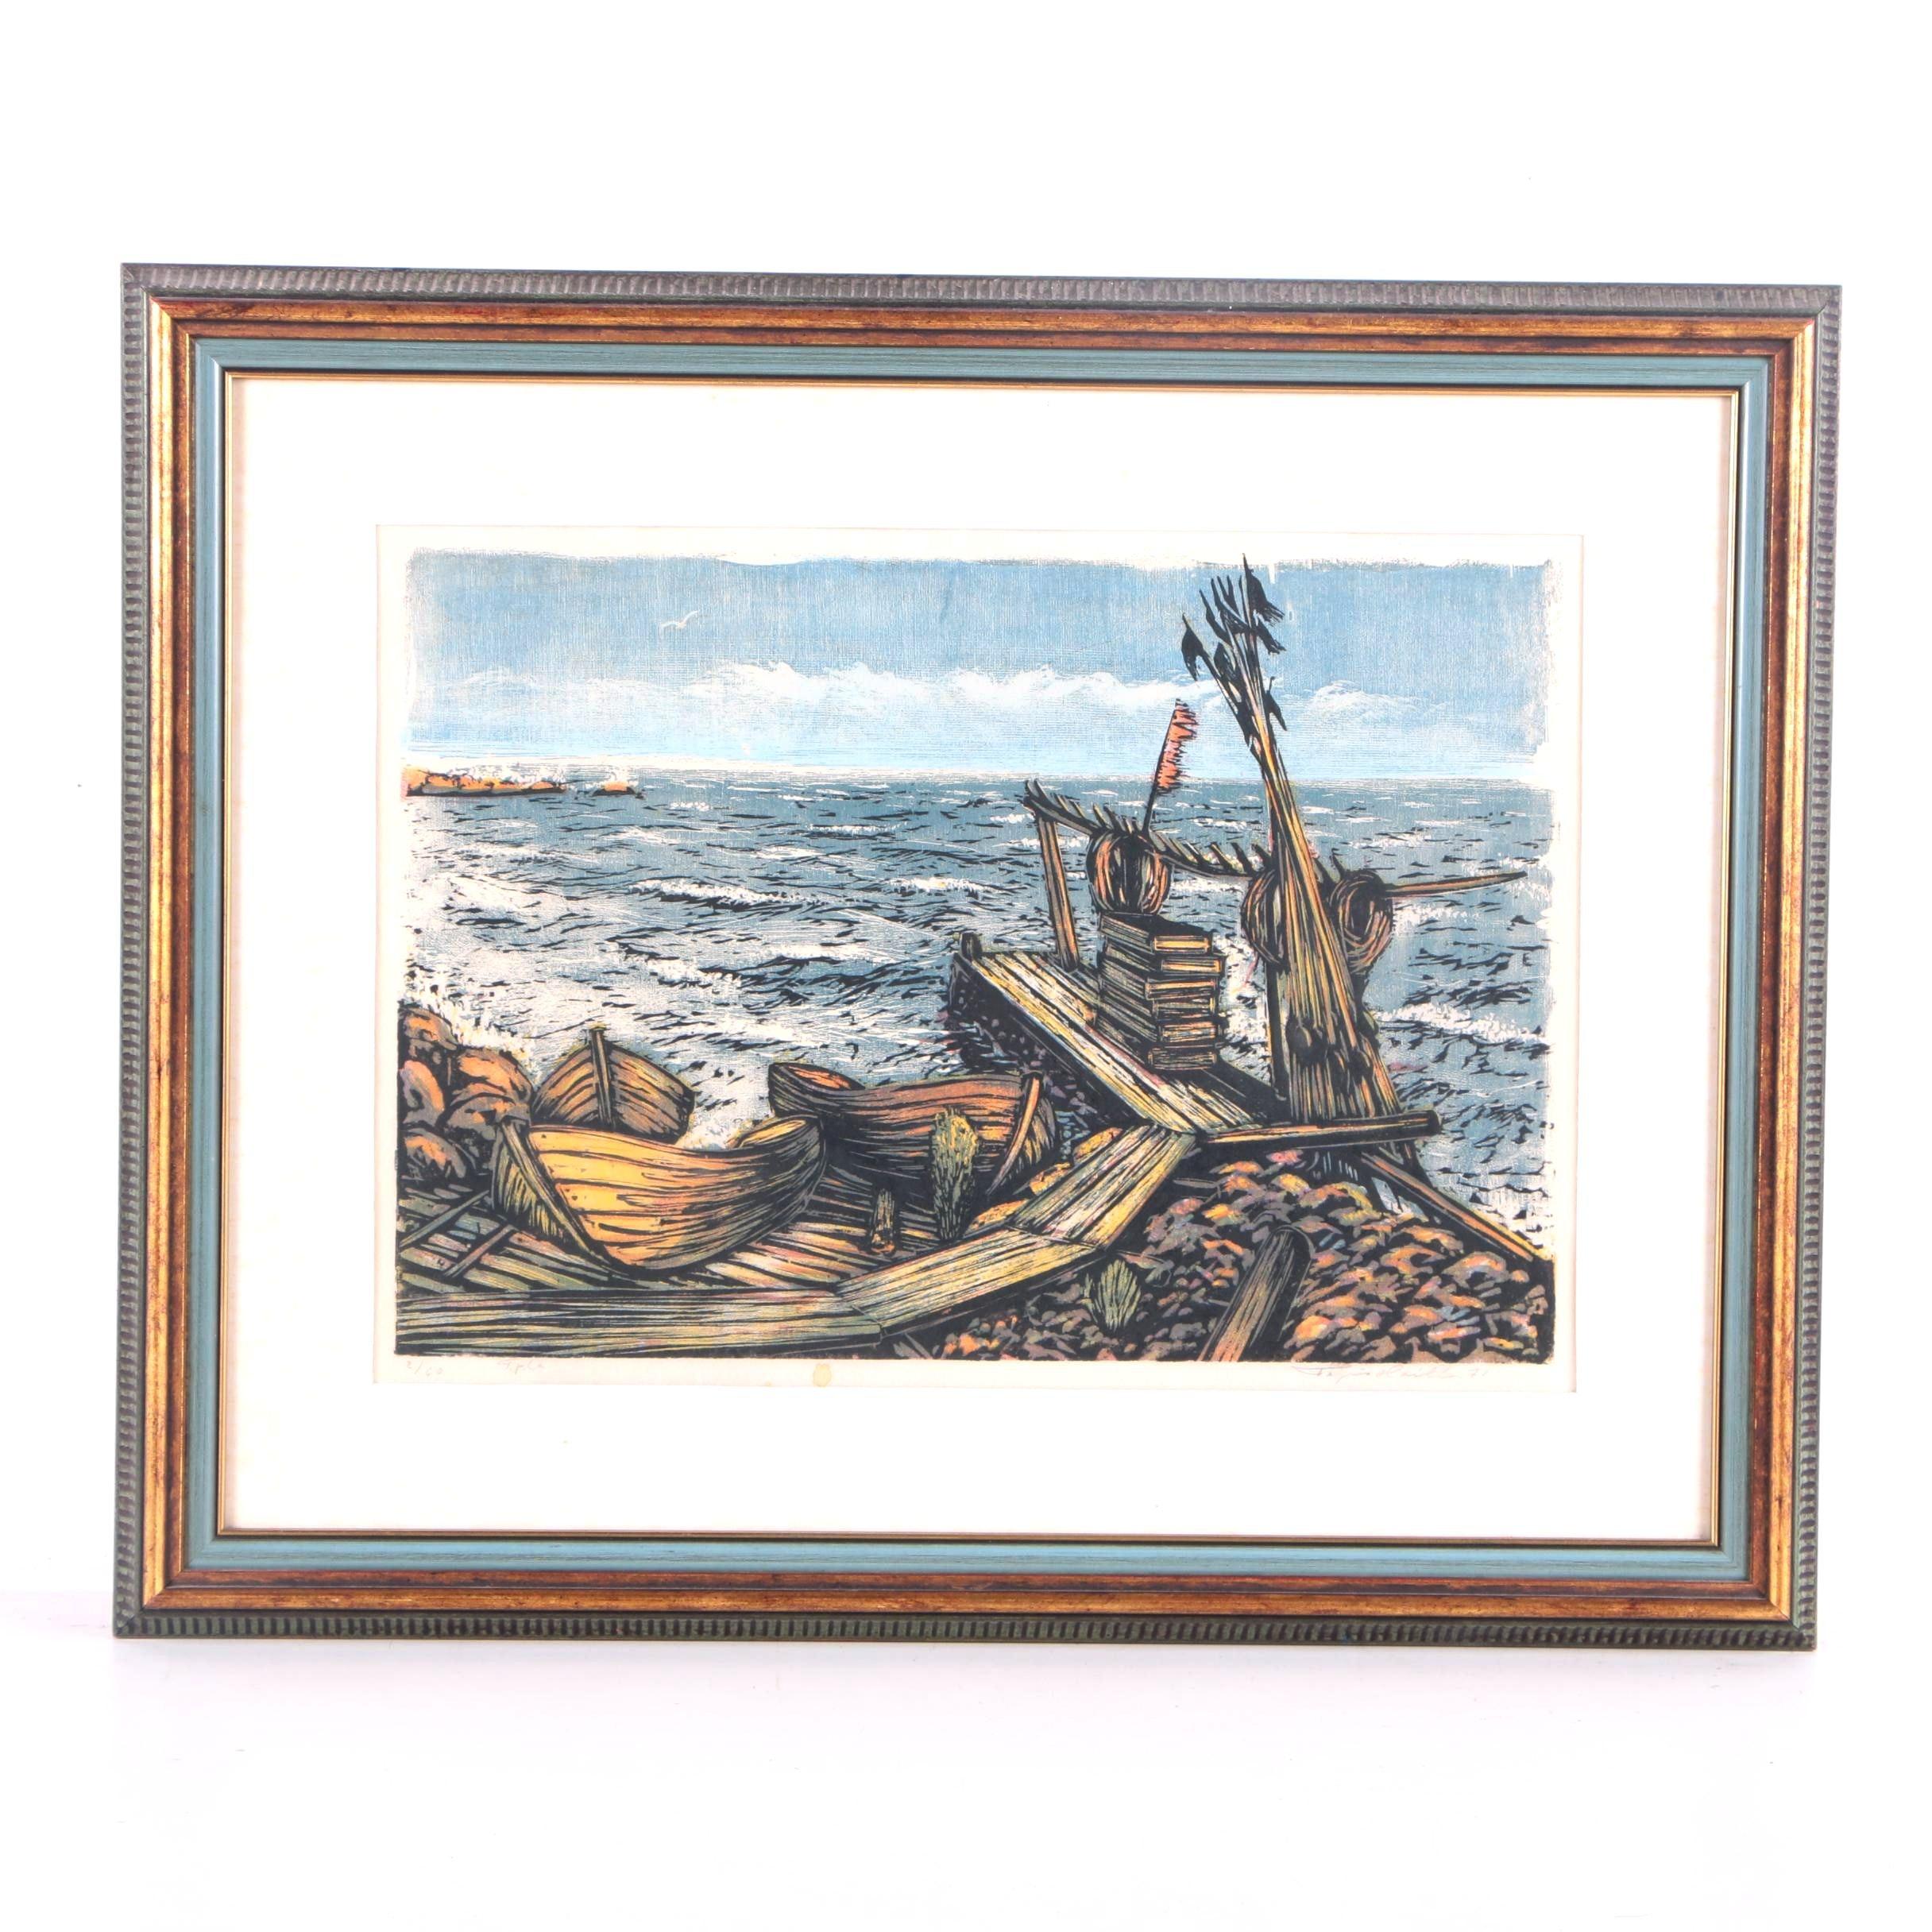 Tapio Haili Limited Edition Serigraph on Paper of Ship Scene